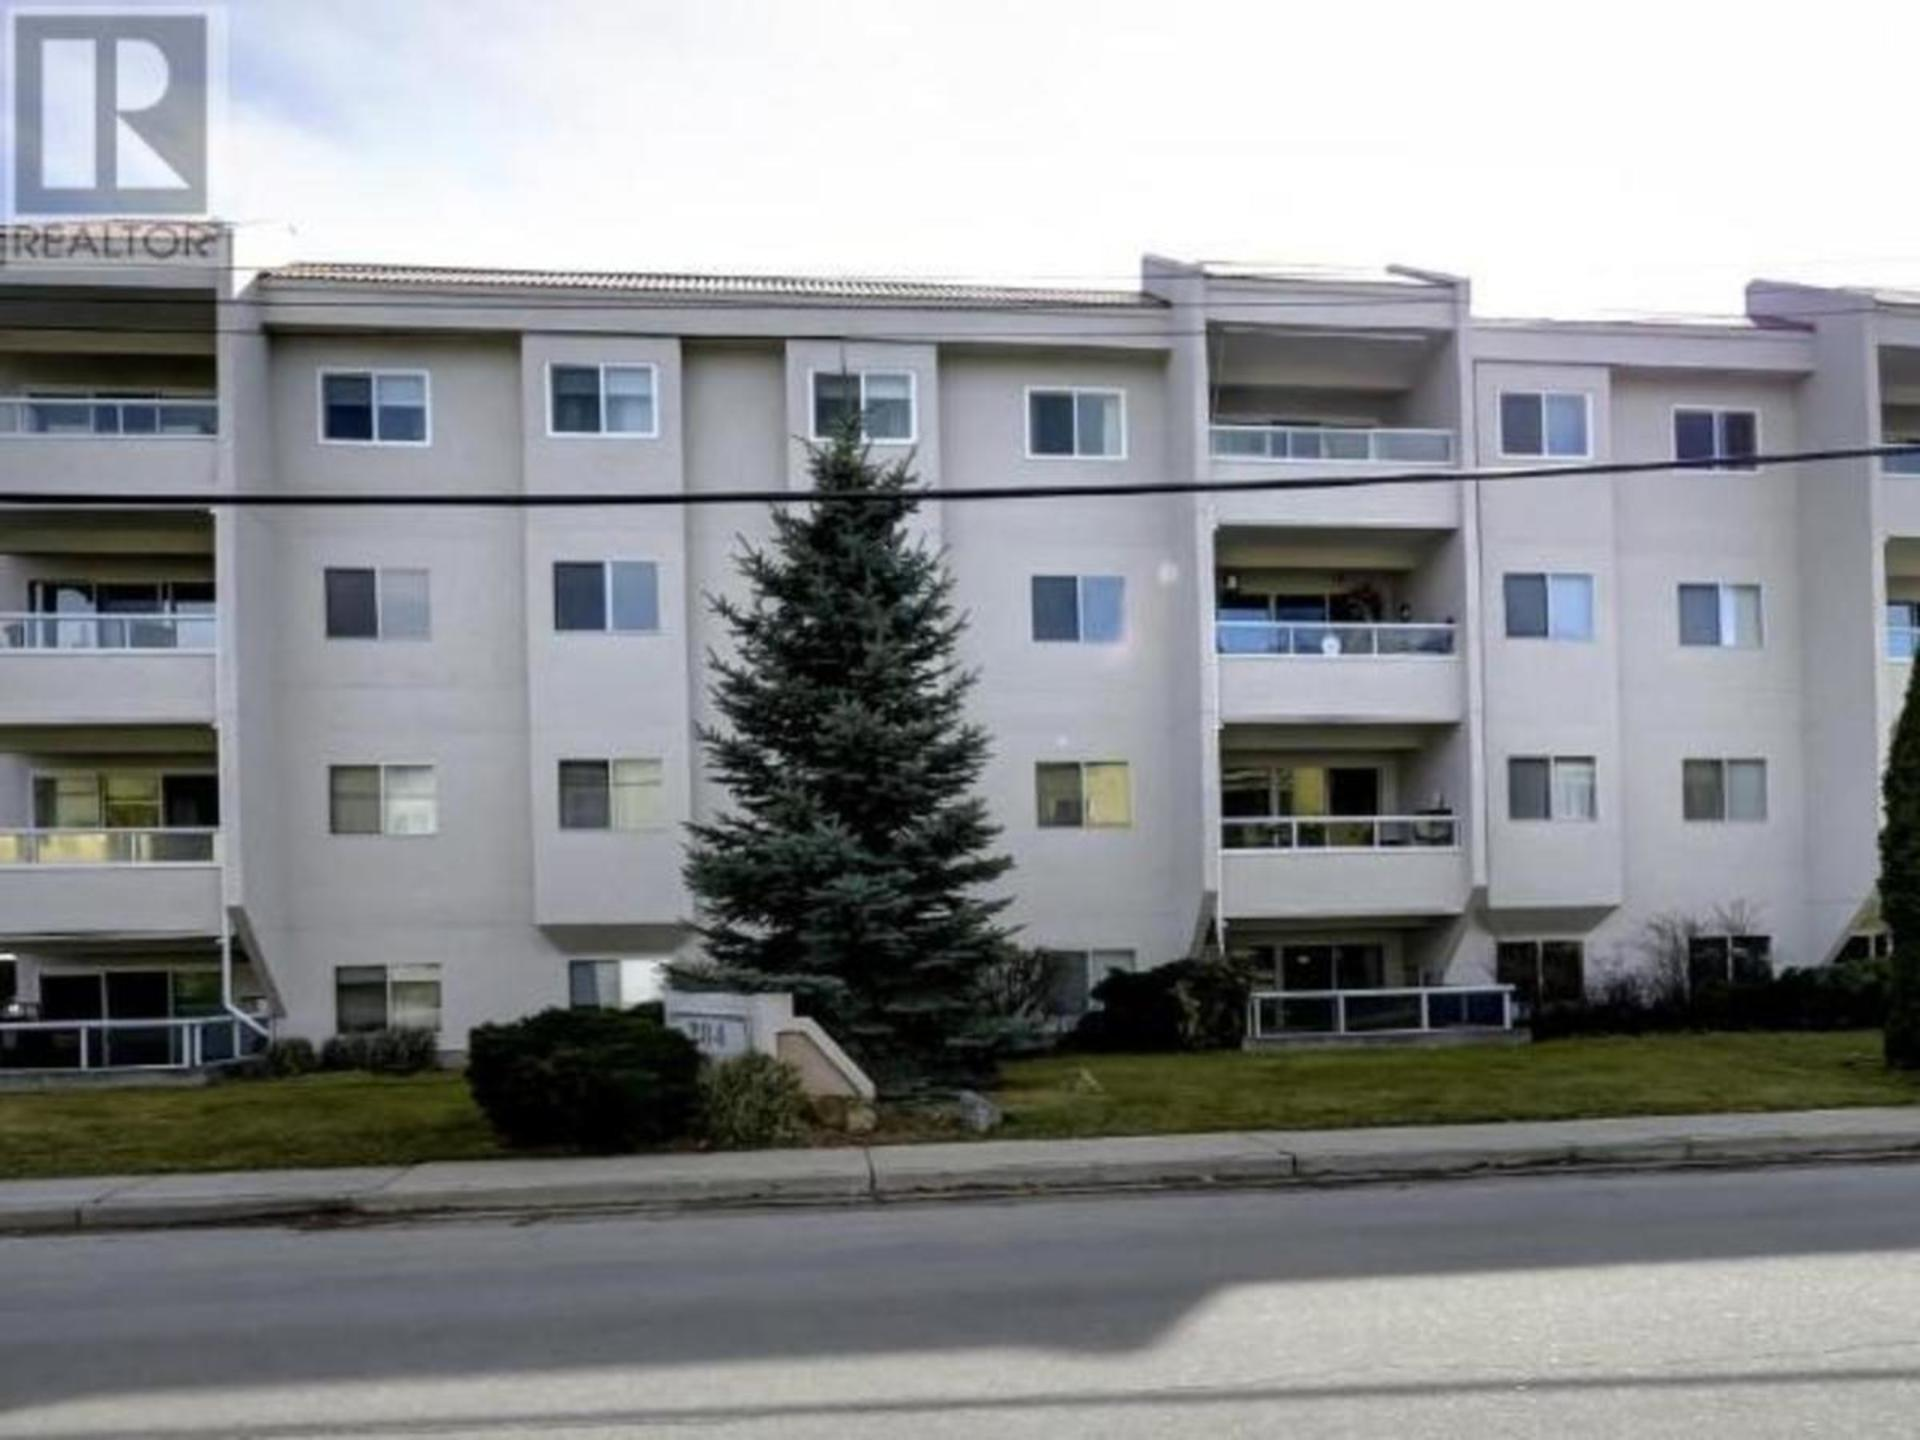 306 - 284 Yorkton Avenue, Main South, Penticton